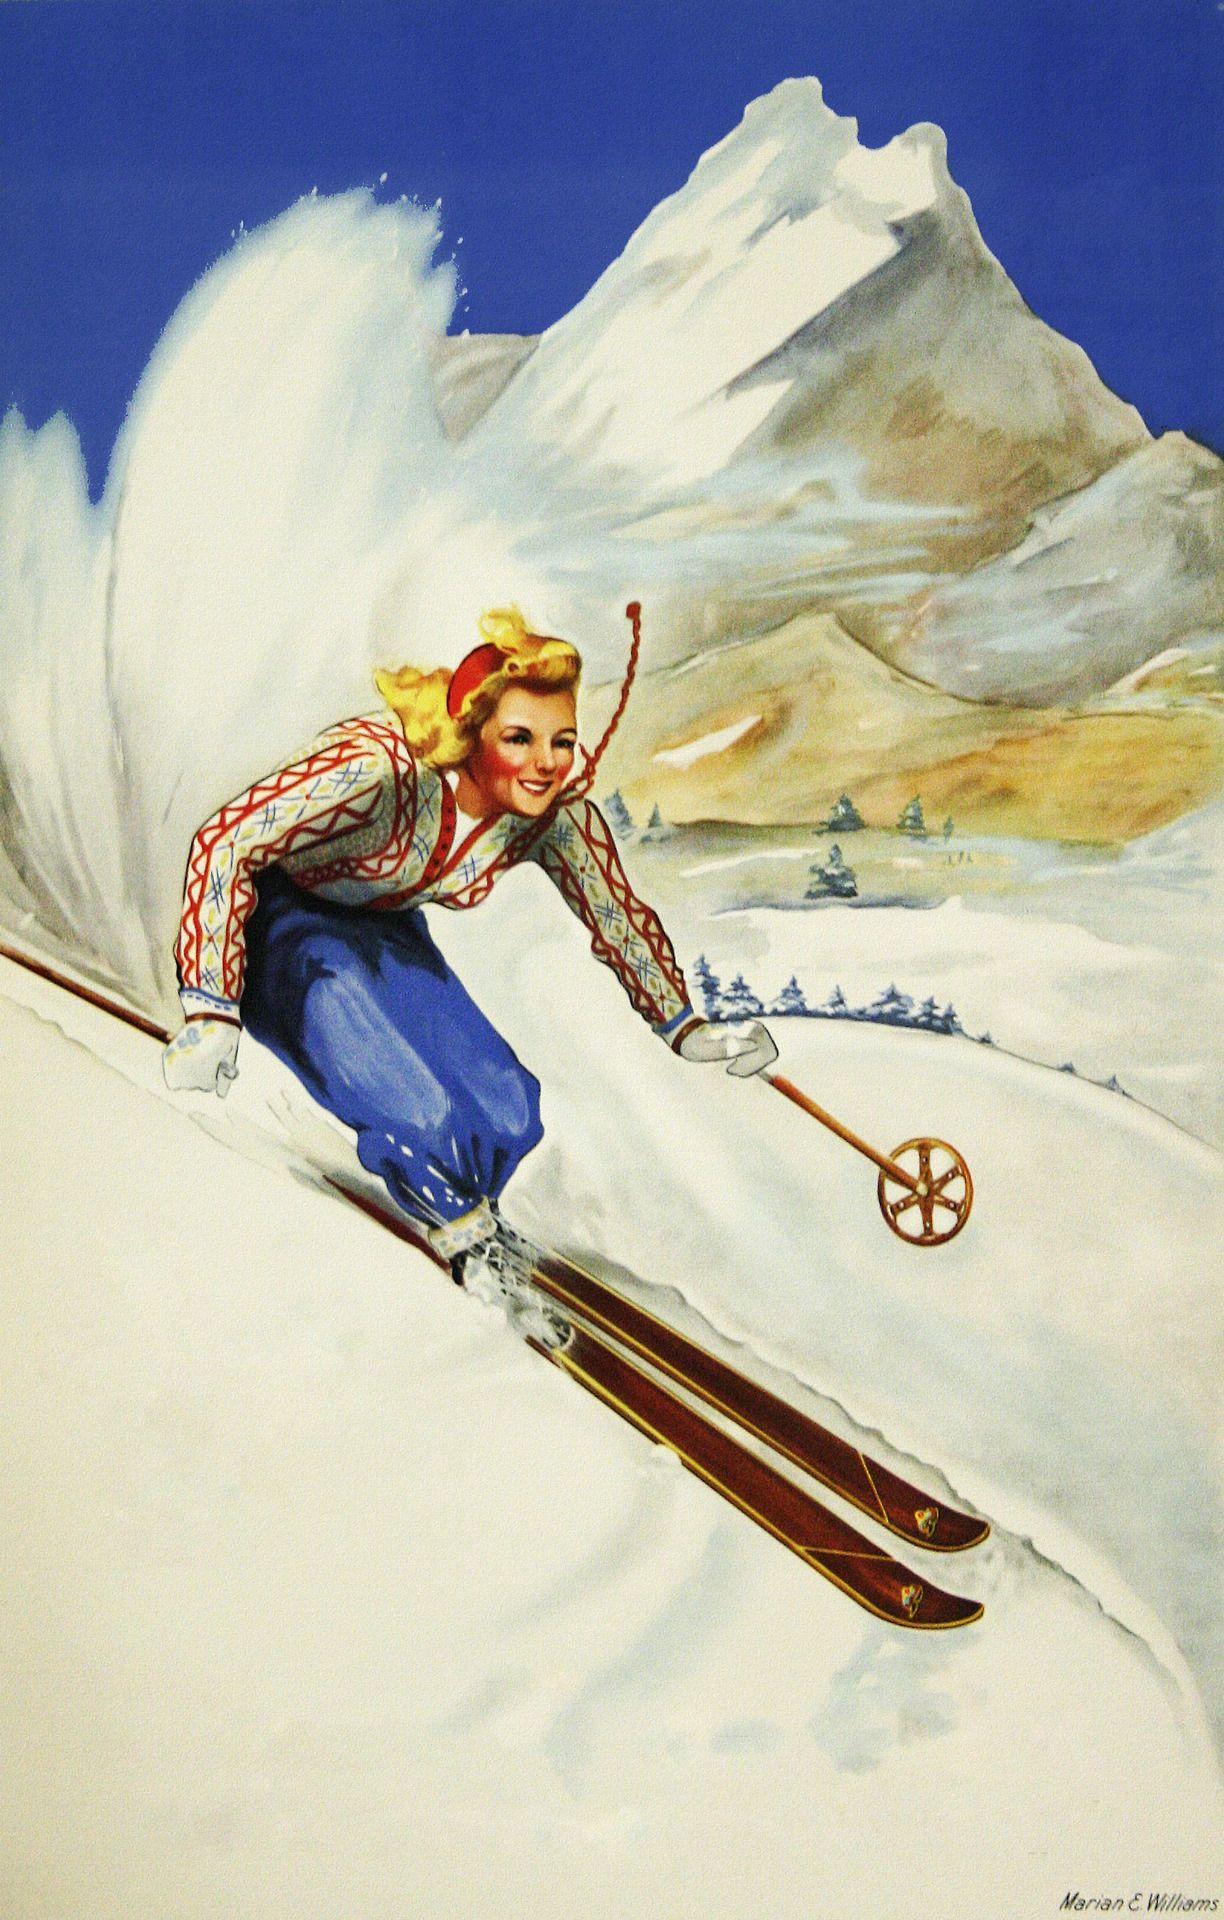 Ski Australia Winter Sport Blonde Vintage Poster Repro FREE S//H Shipped Rolled